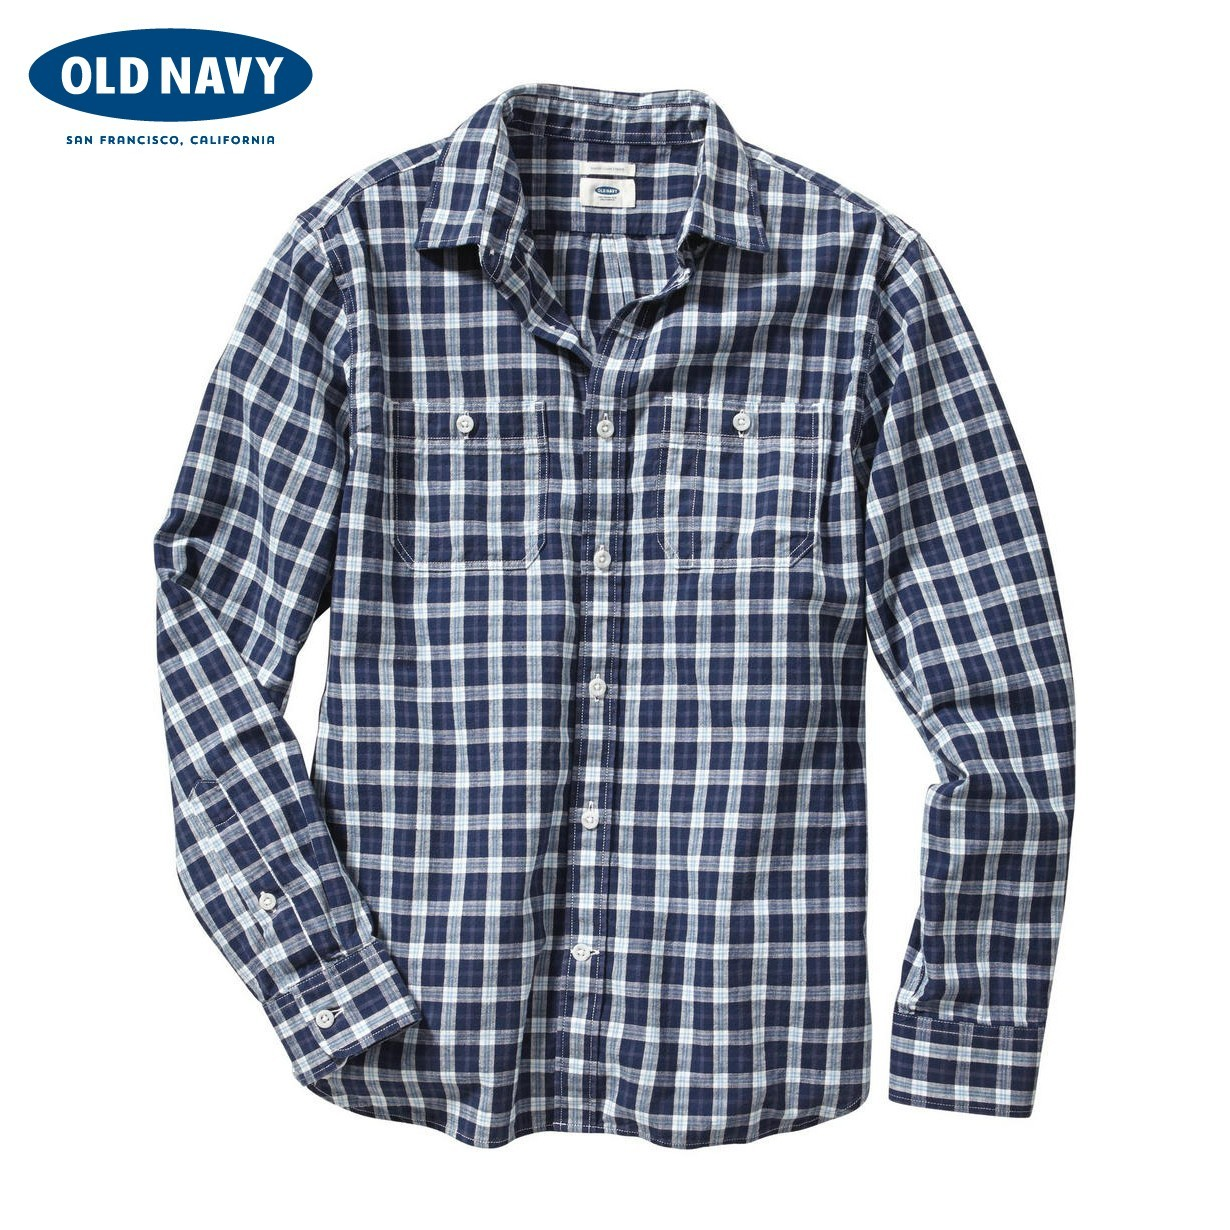 Рубашка мужская OLD NAVY 000119321 119321 рубашка мужская old navy 000438245 438245